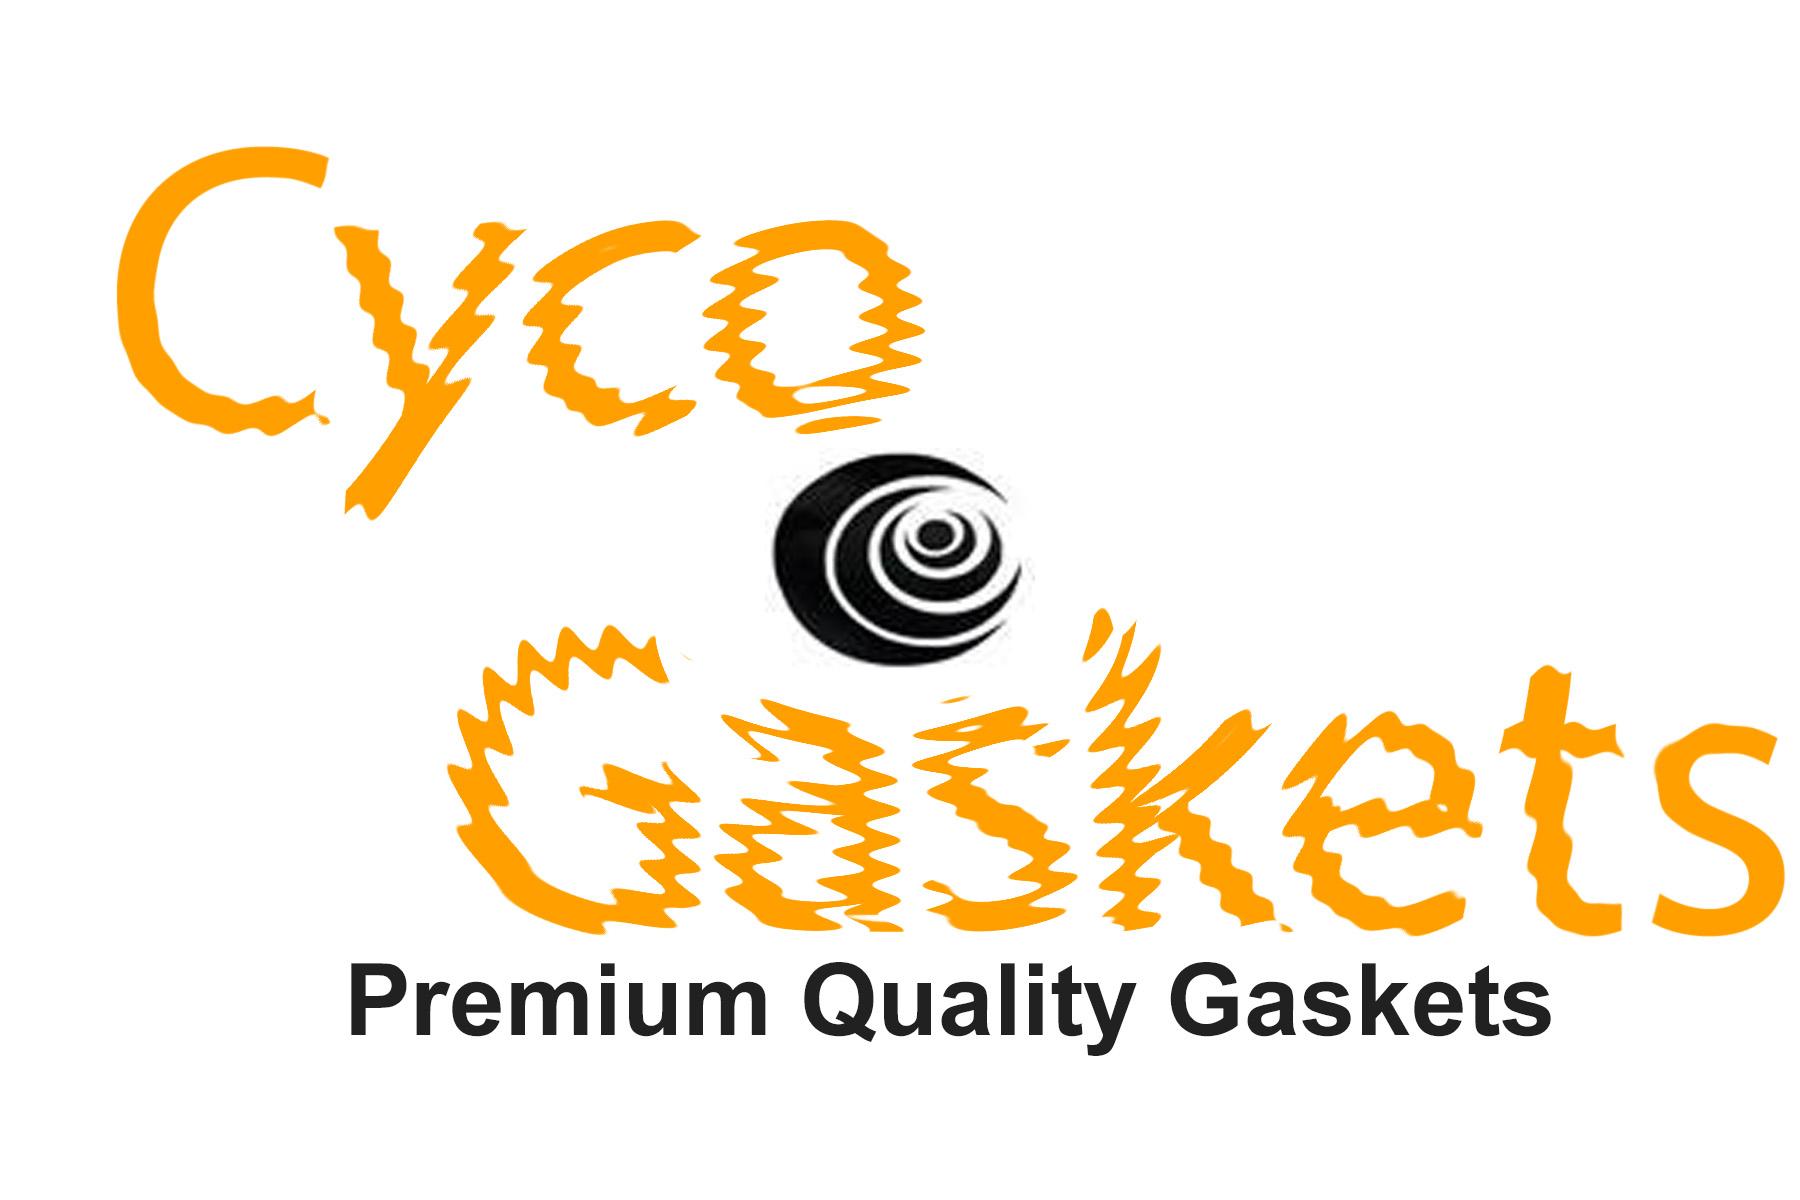 Cyco Gaskets